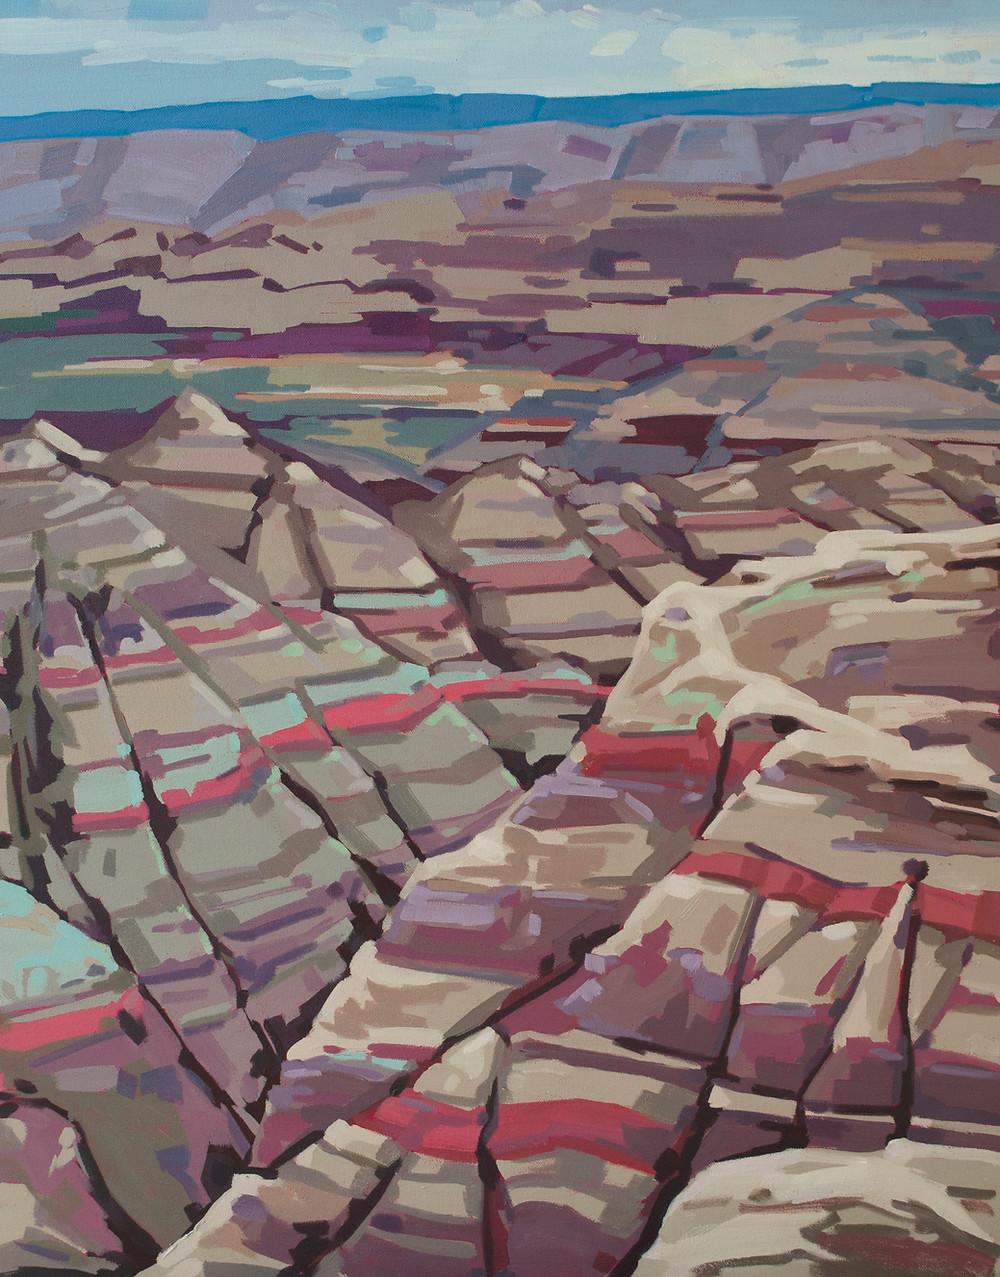 big badlands painting ostrowski